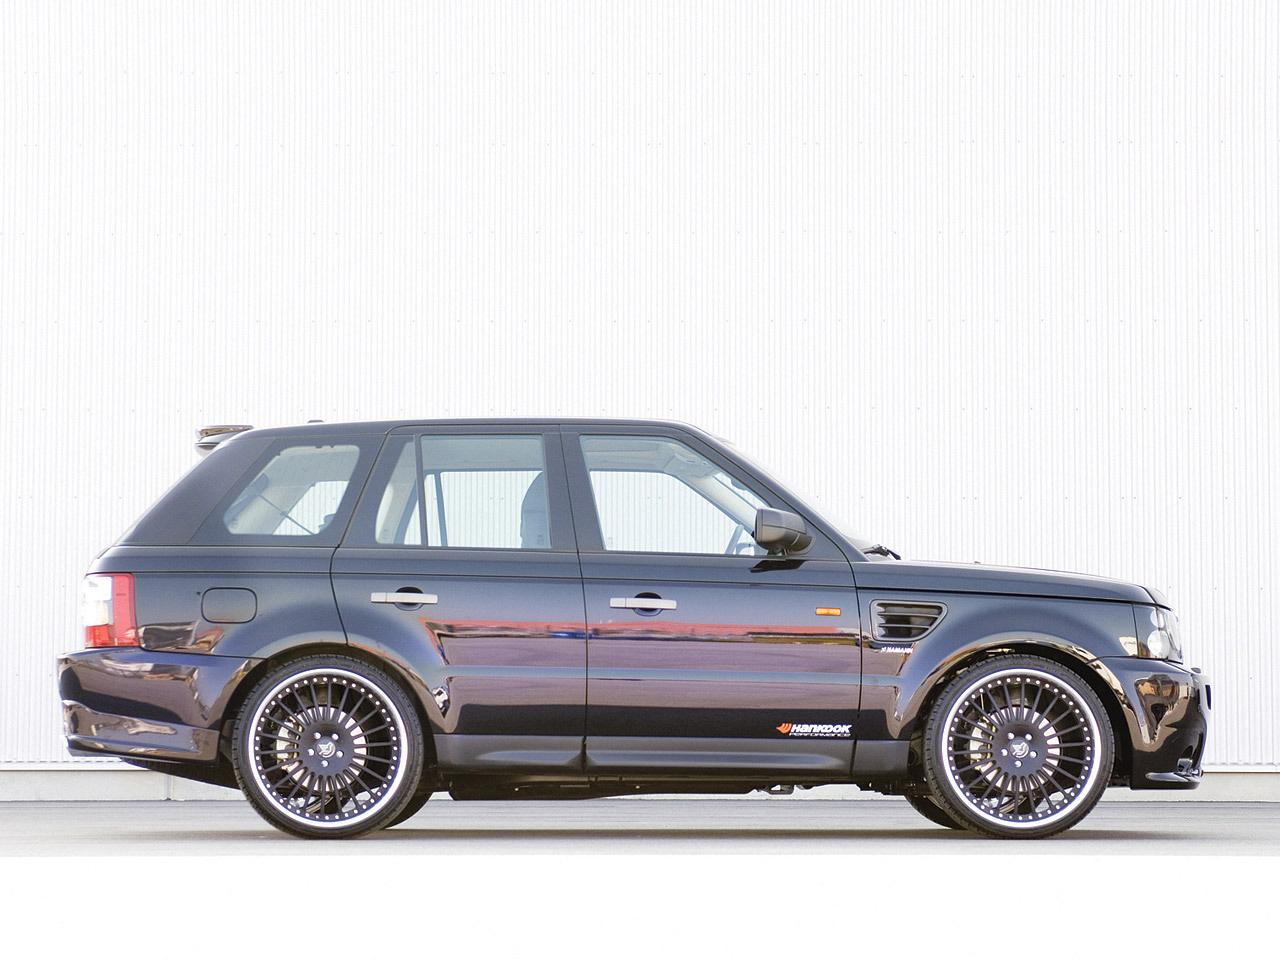 Hamann Range Rover Sport Photos Photogallery With 7 Pics